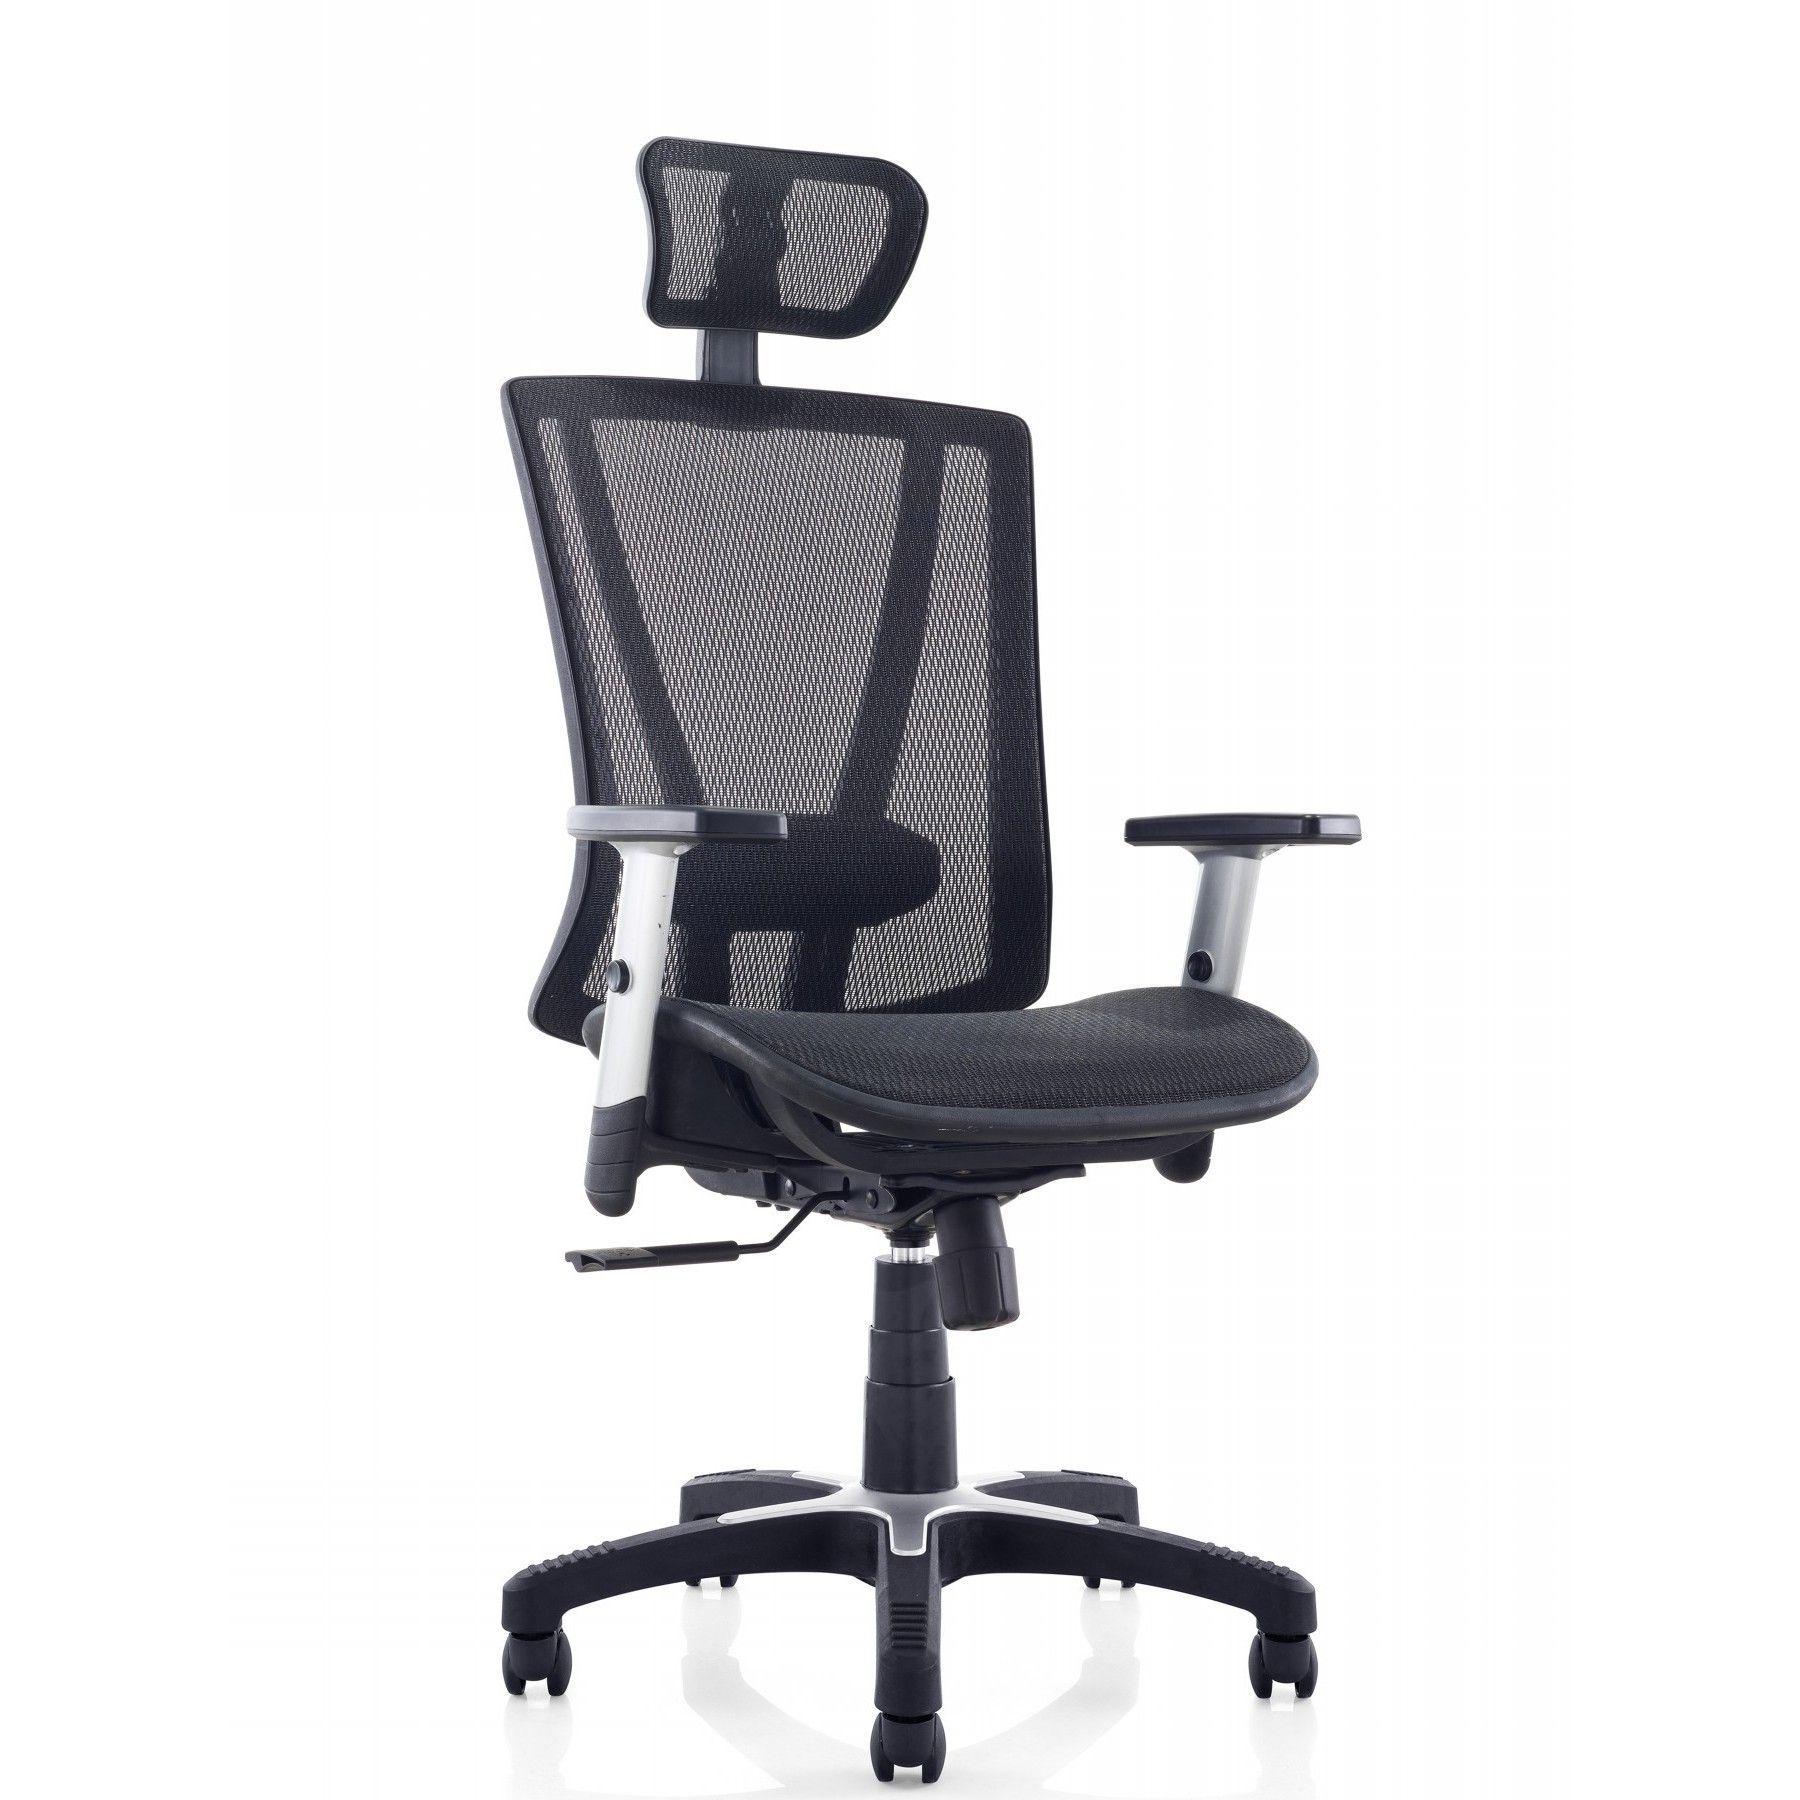 Ergomax Office Fully Meshed Ergonomic Height Adjustable Black